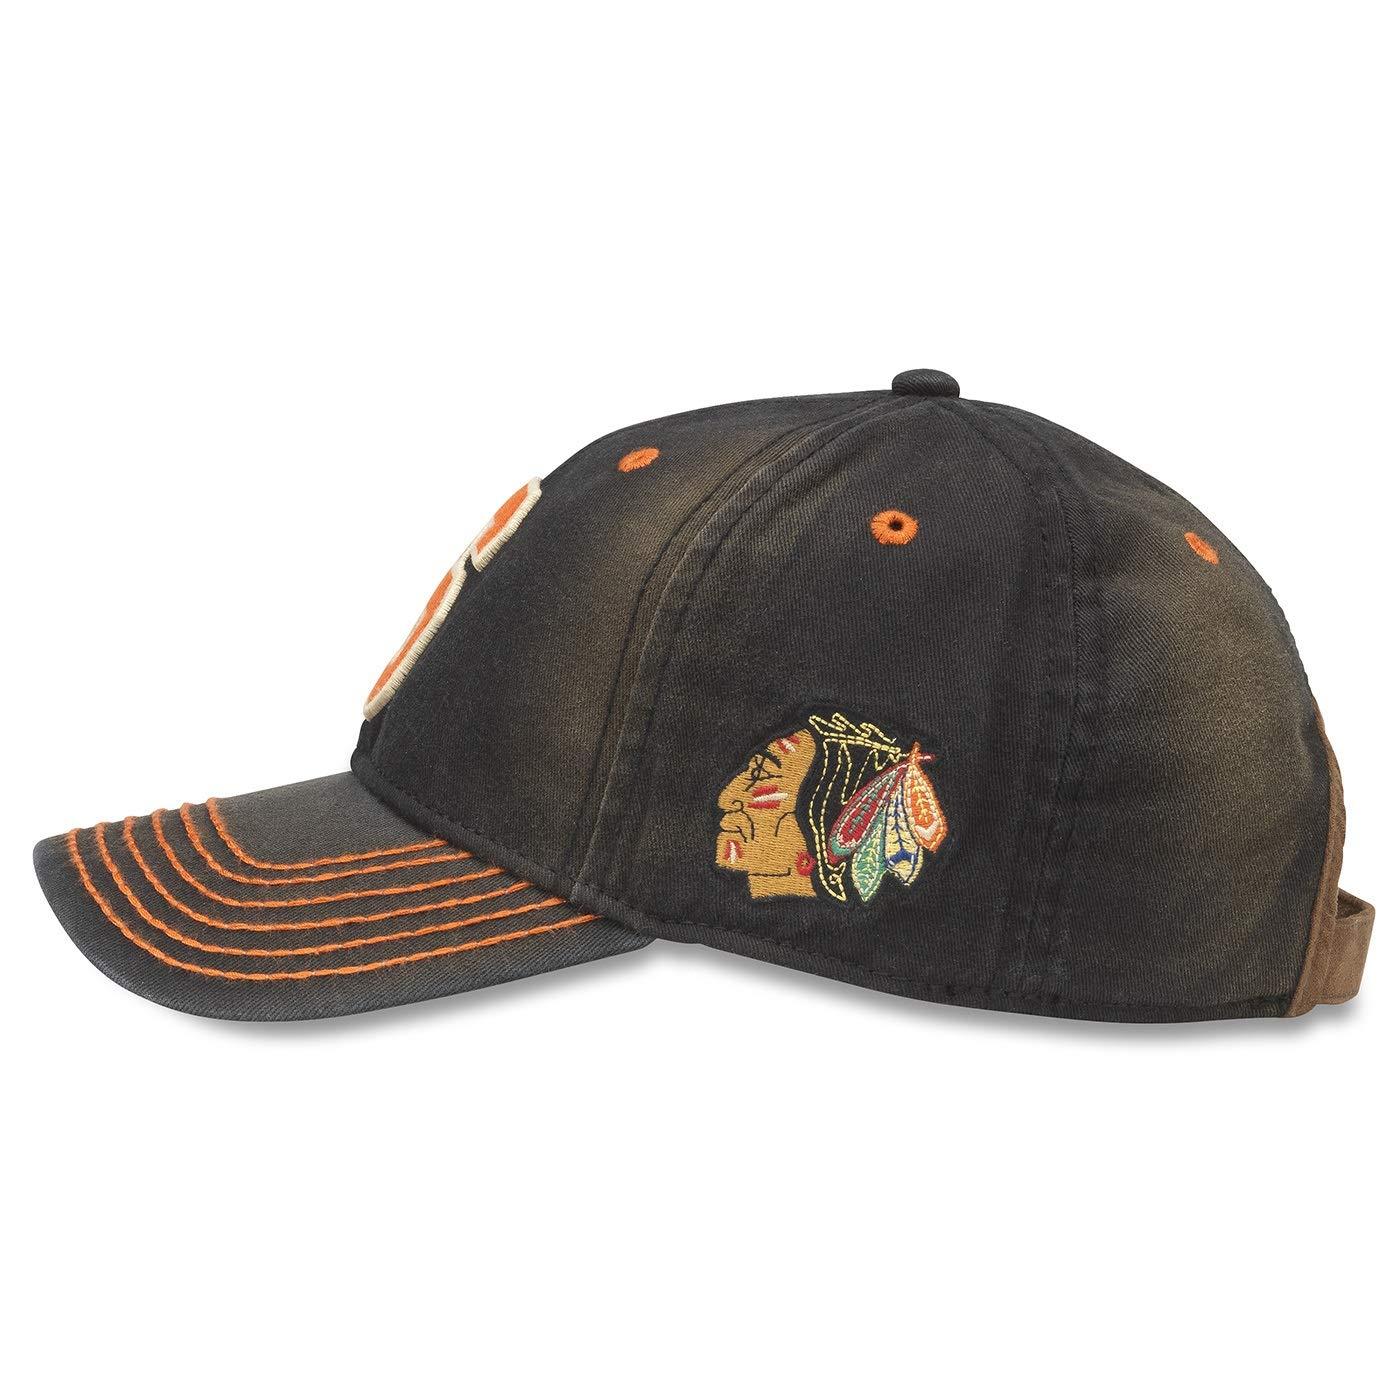 American Needle NHL Original 6 Team U2 Squared Distressed Washed Adjustable Hat